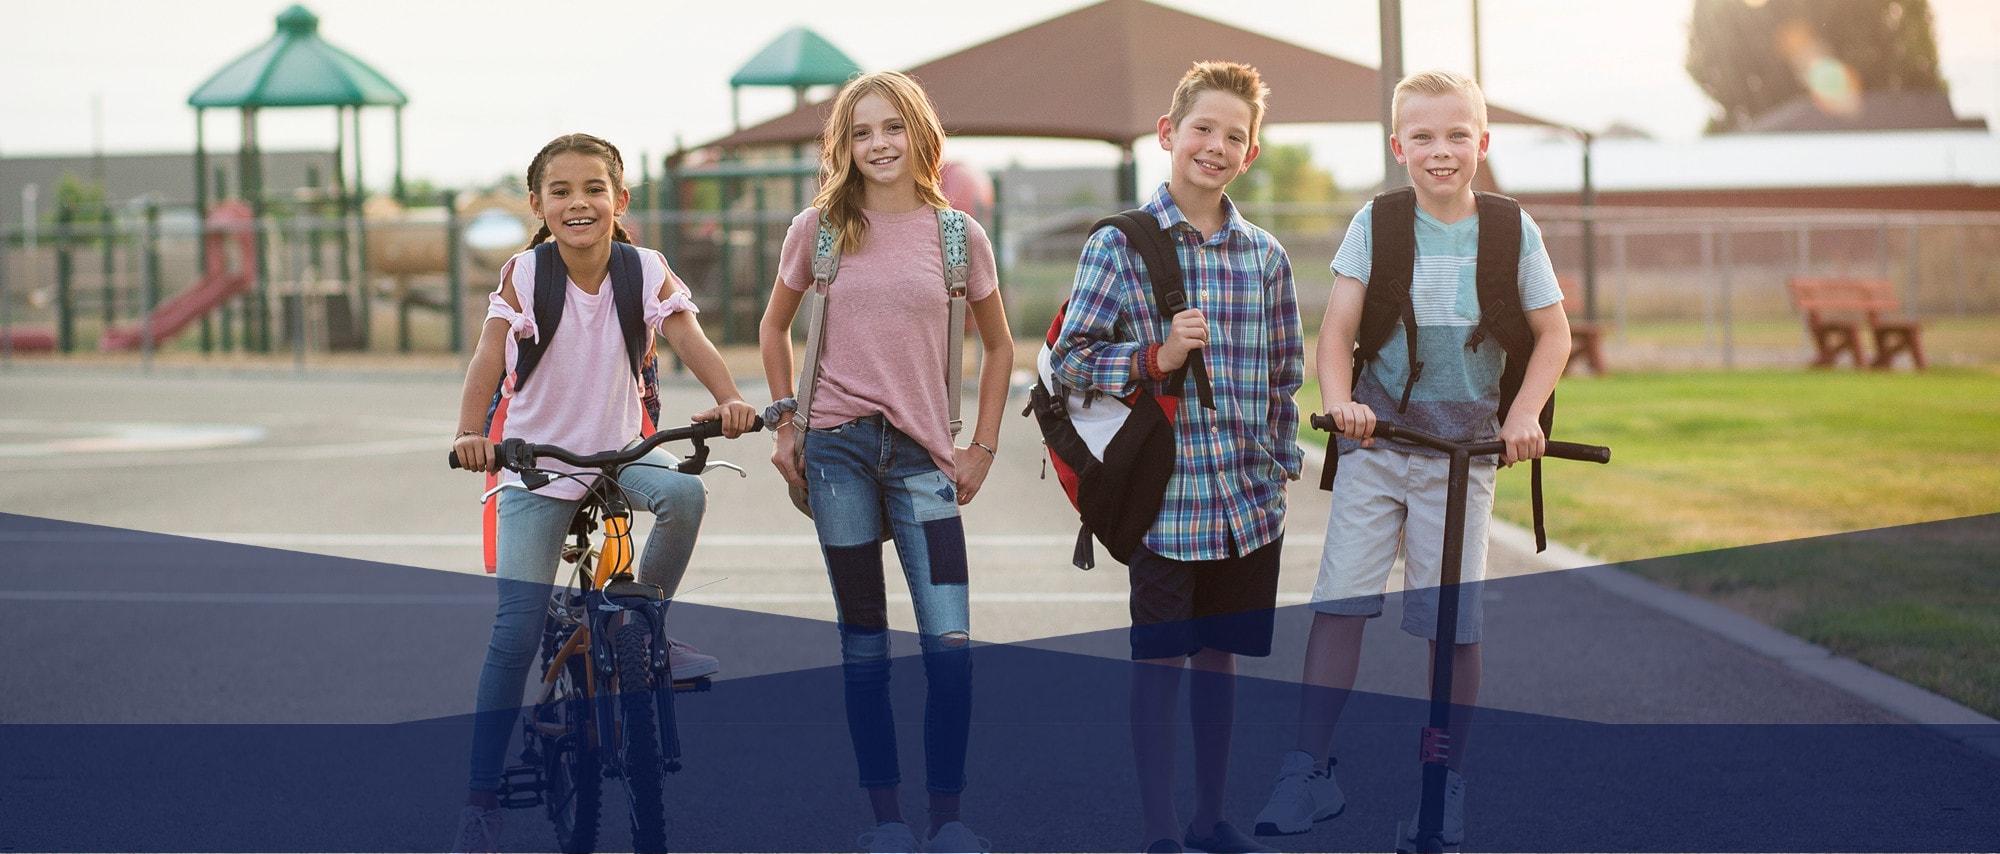 Kids sitting on bikes